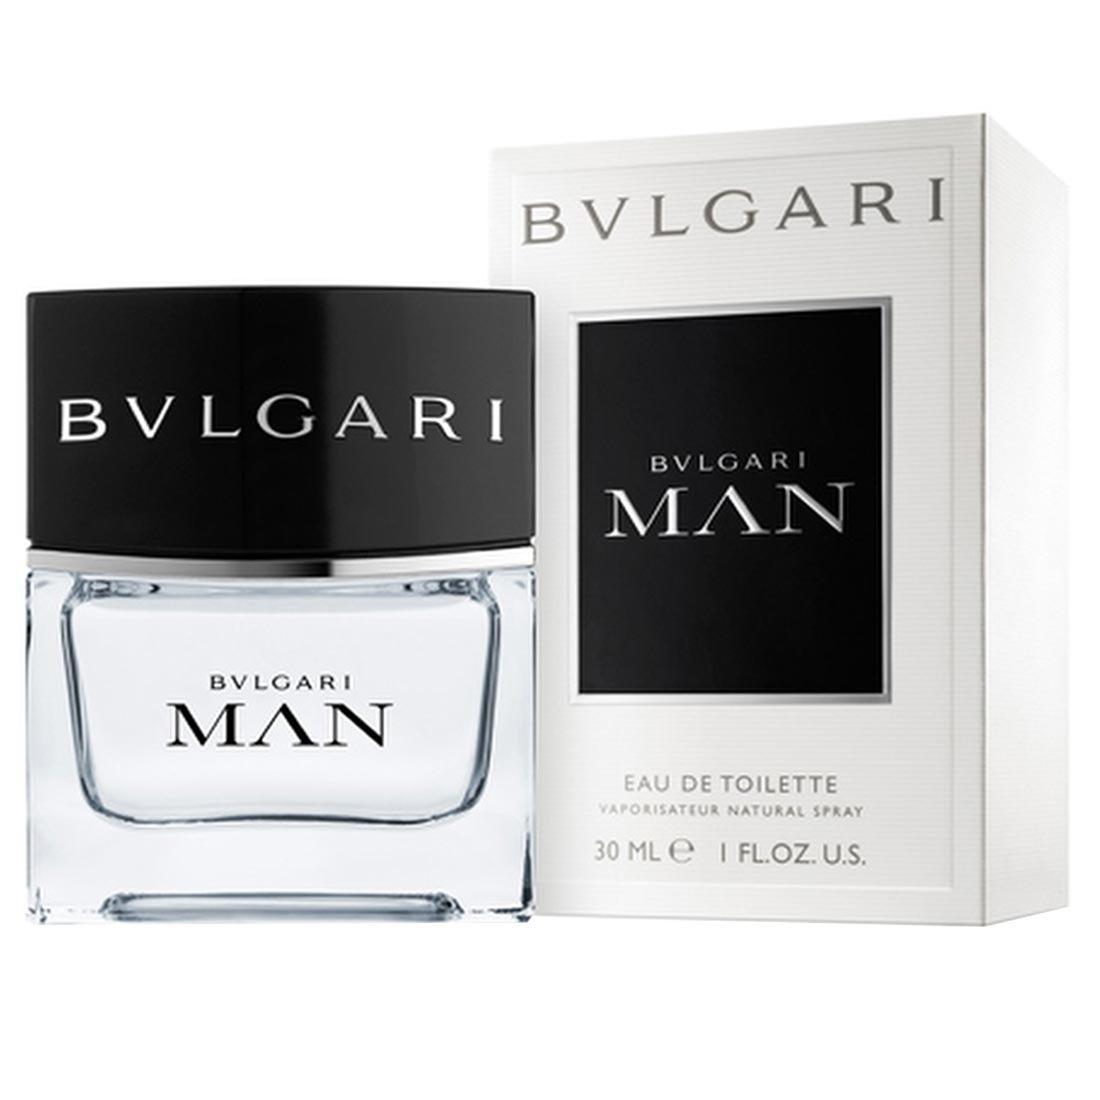 perfume bvlgari man extreme masculino eau de toilette 30ml. Carregando zoom. c6c8b09824